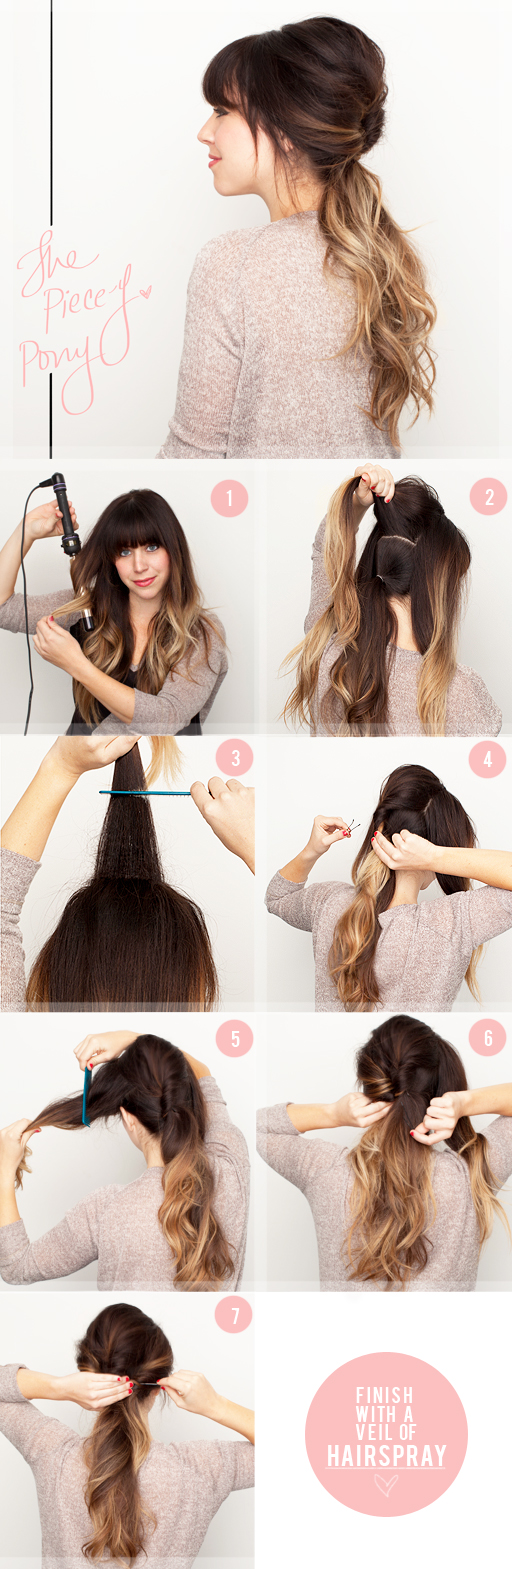 pony hair tutorial